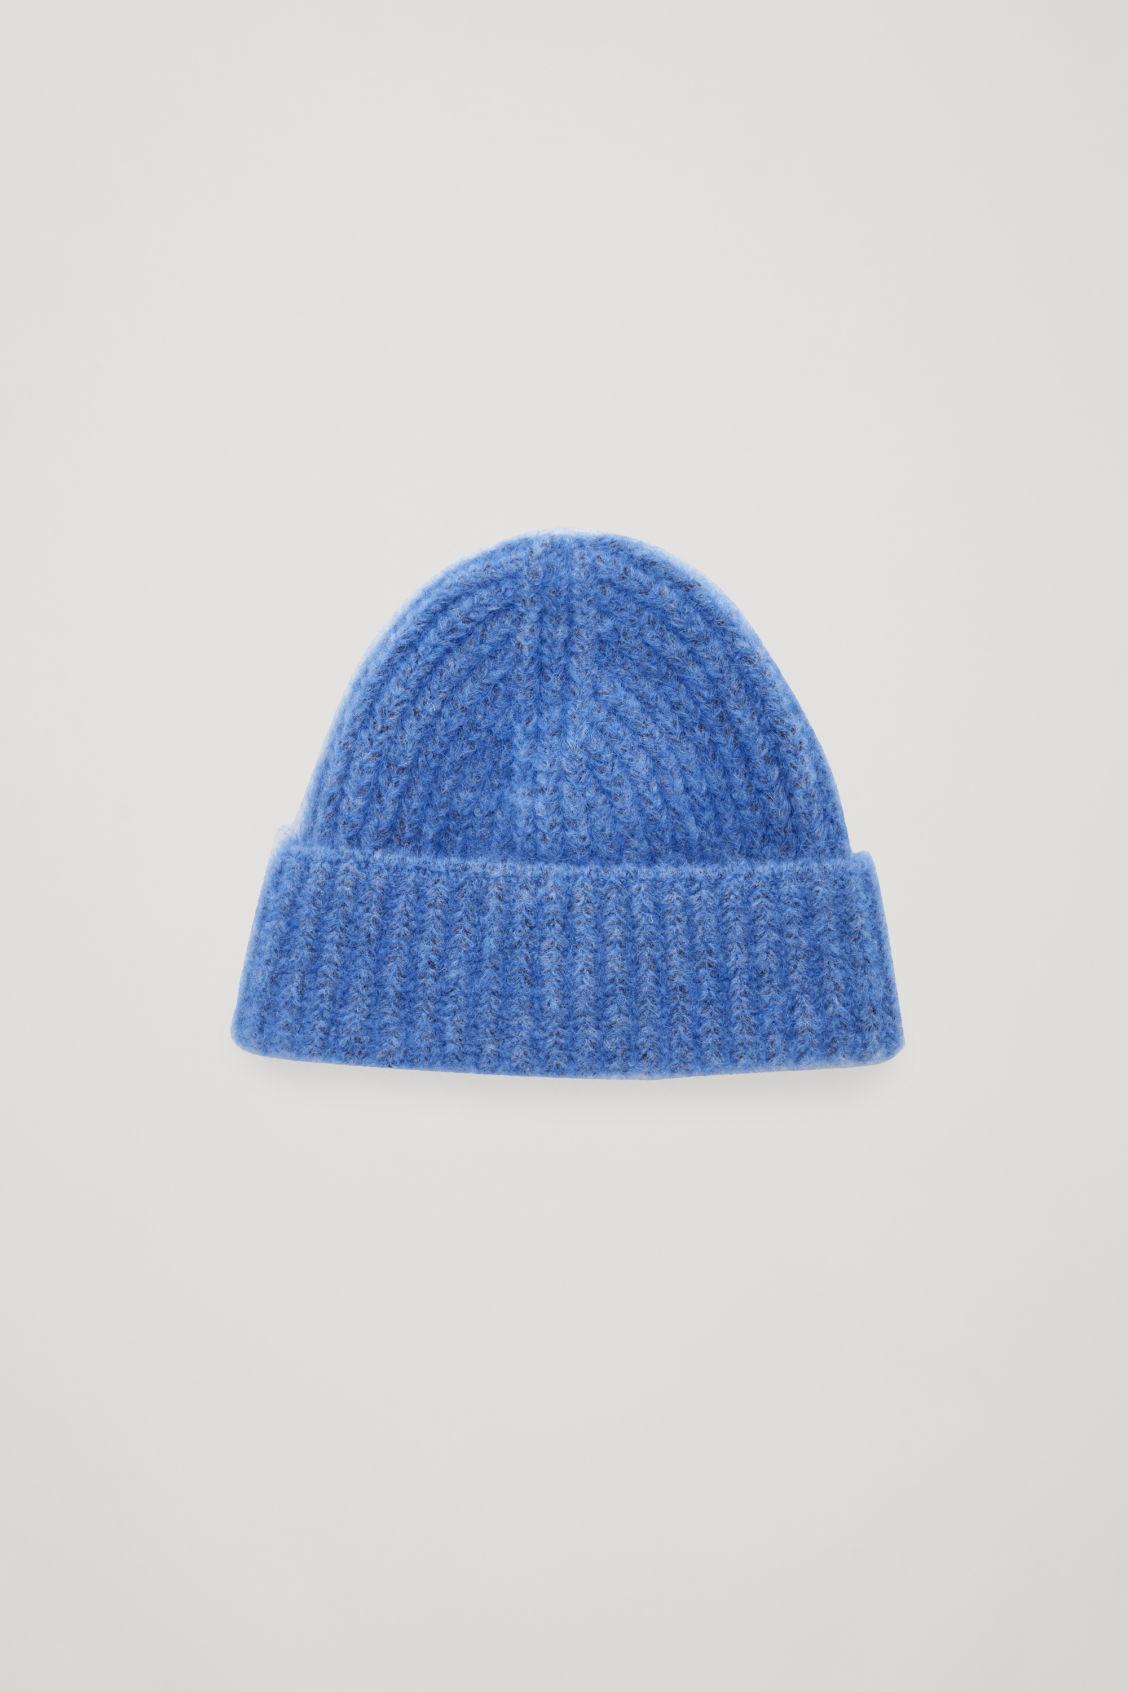 FUZZY RIBBED-WOOL HAT - Sky blue melange - Hats Scarves and Gloves - COS 85da732d5743